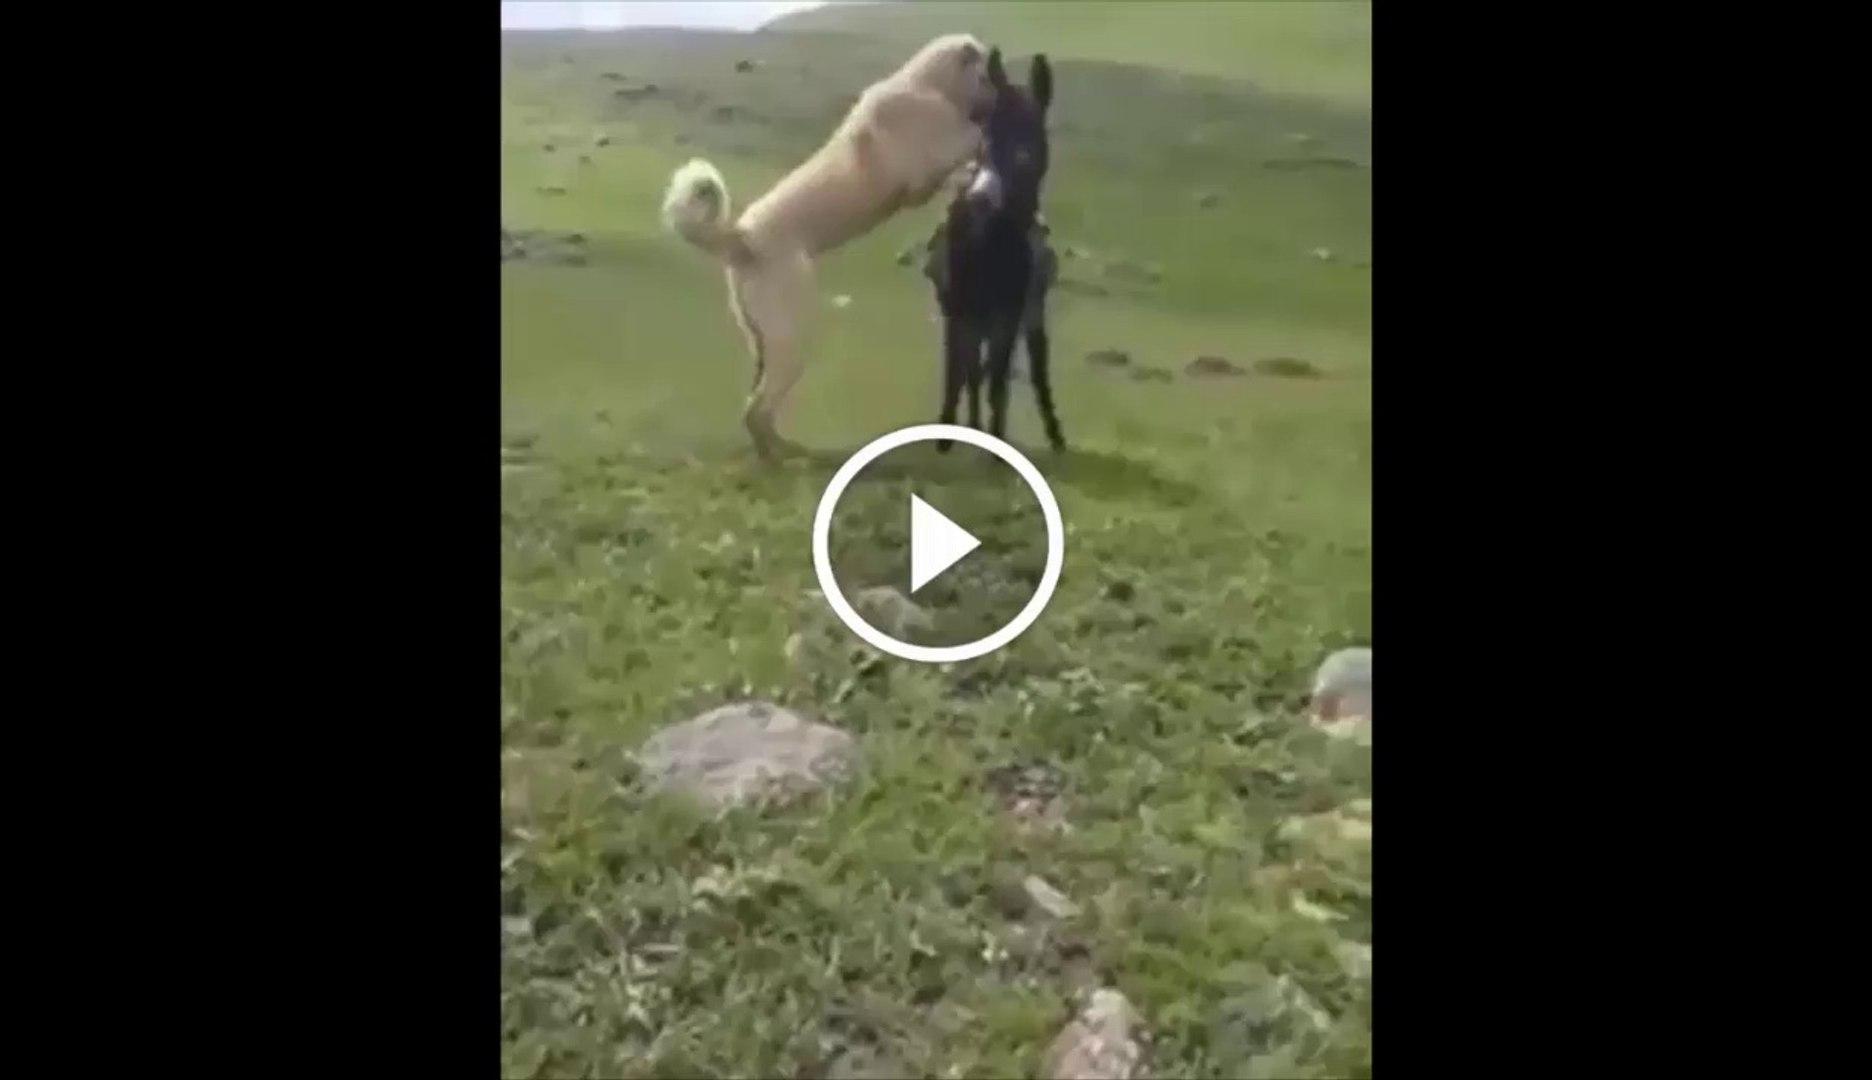 ESSEK KADAR ANADOLU COBAN KOPEGi - ANATOLiAN SHEPHERD DOG and DONKEY PLAY